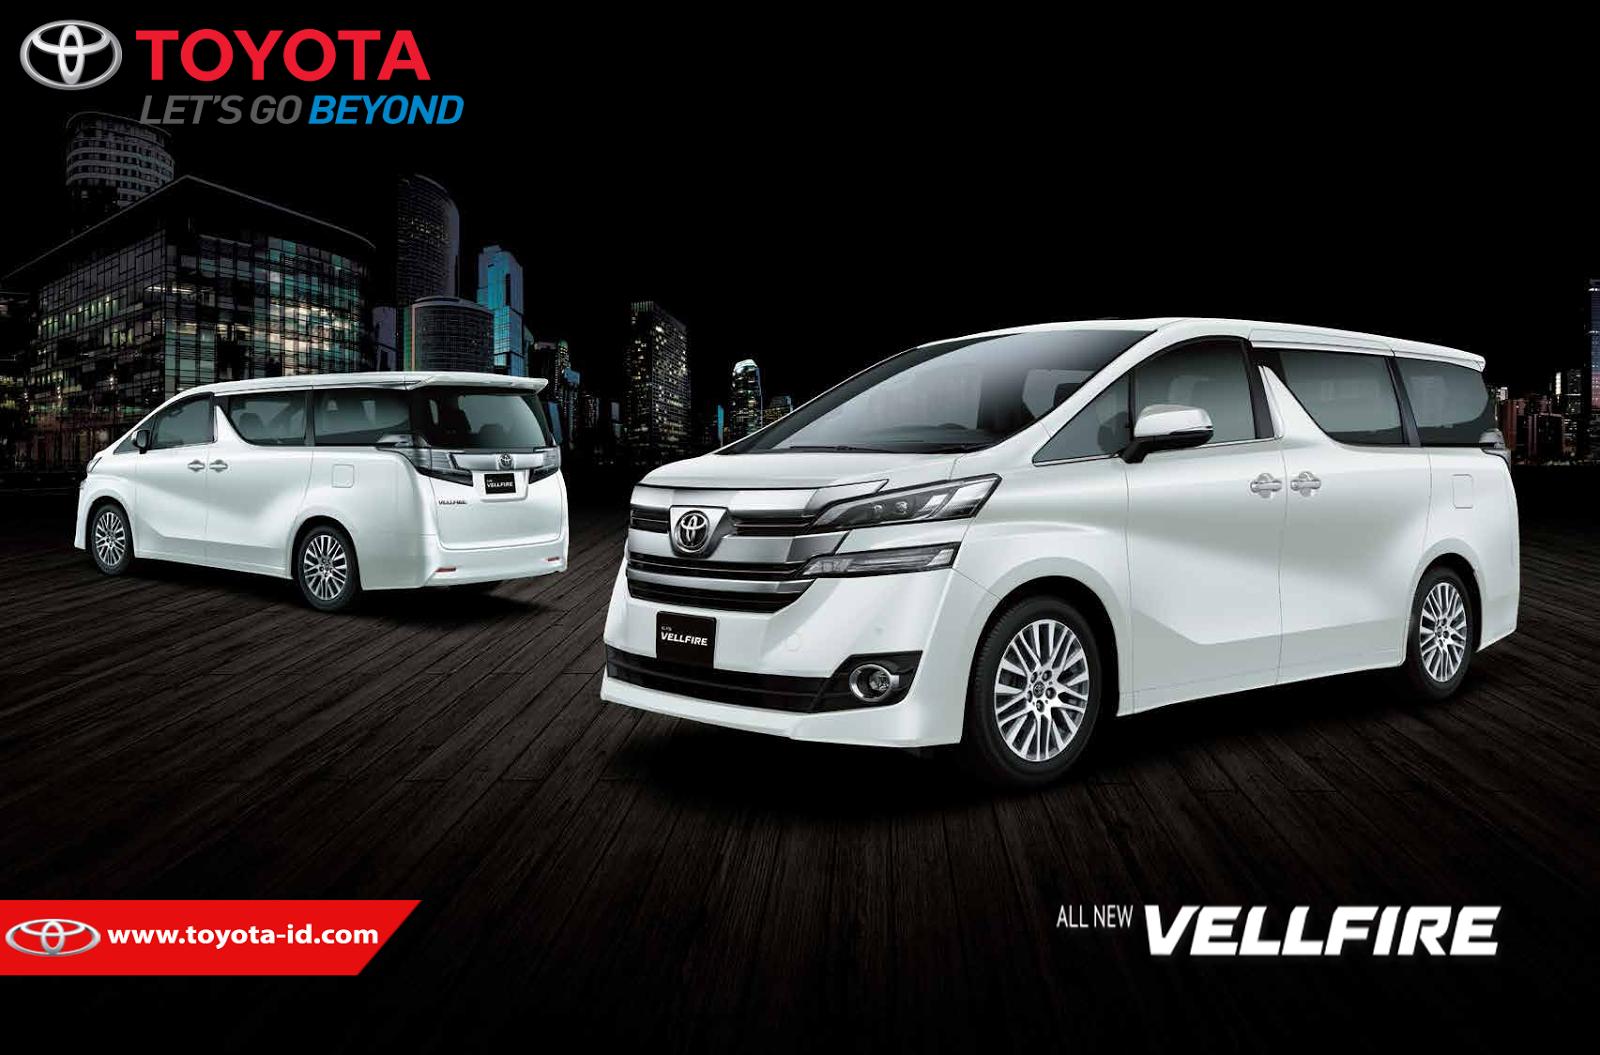 harga mobil all new vellfire filter bensin grand avanza spesifikasi toyota astra indonesia menjadi simbol mereka yang aktif berjiwa sporty dan sukses exterior villfire